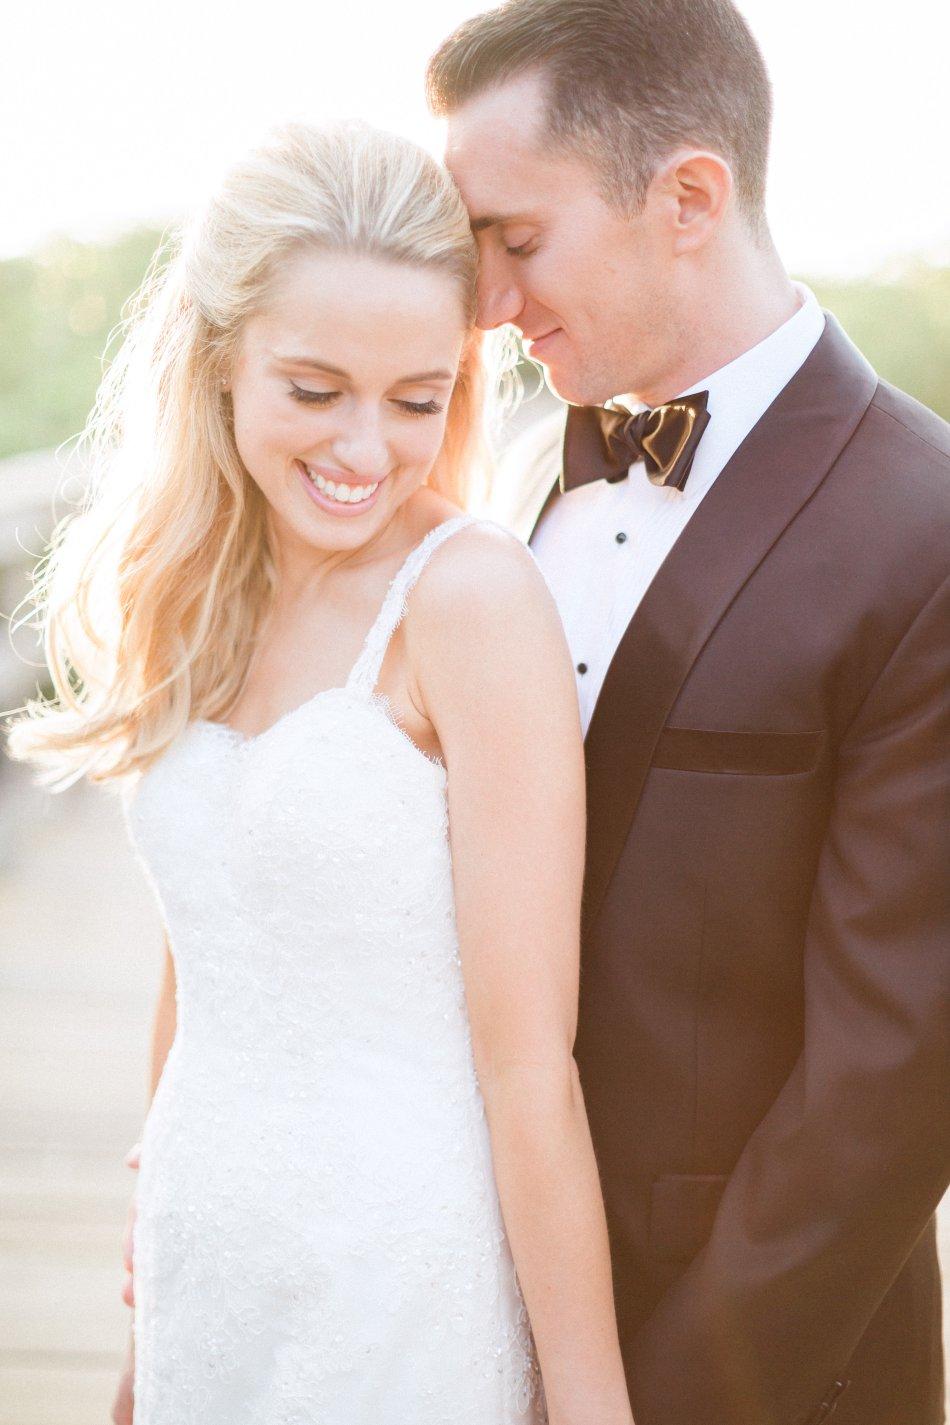 coconut-point-hyatt-wedding-naples-wedding-photography_0525.jpg